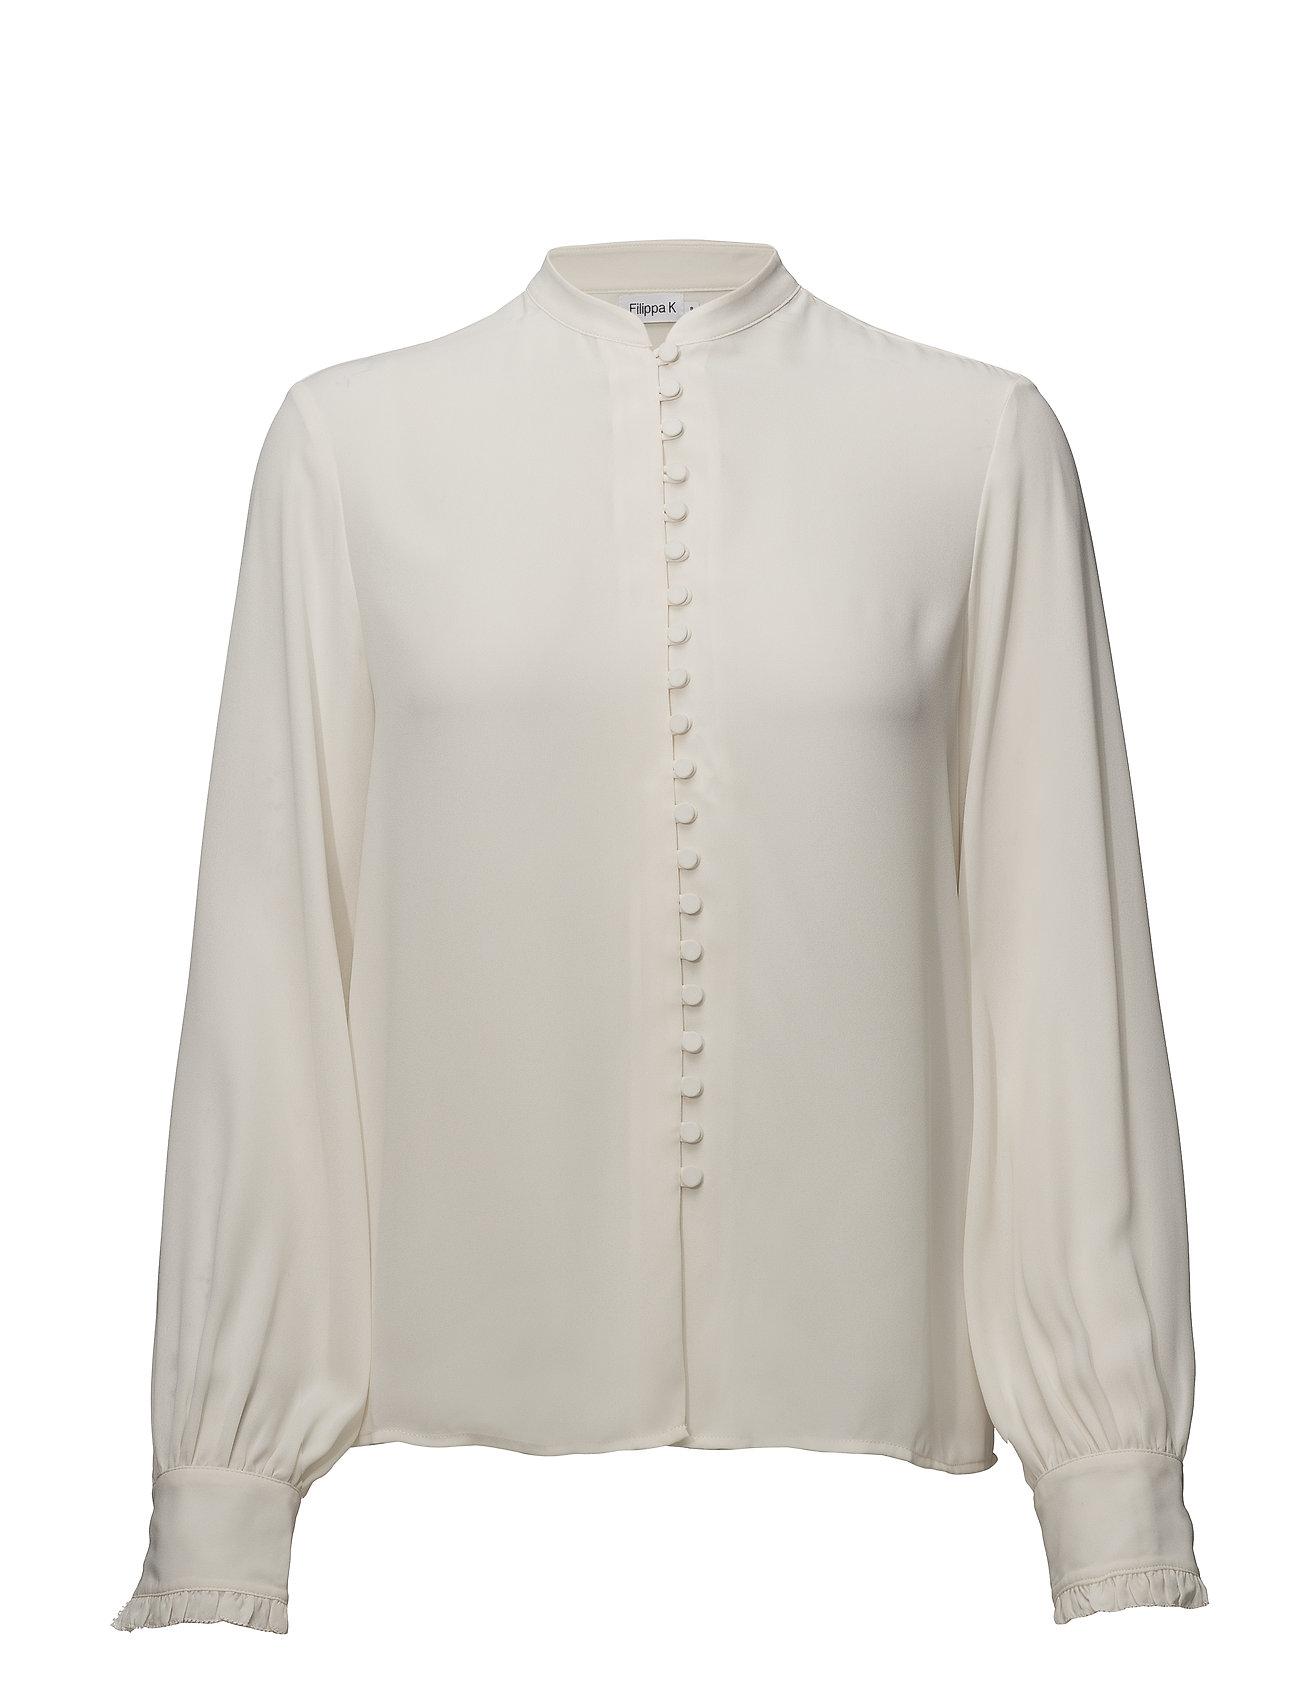 Filippa K Sheer Button Blouse - CREAM